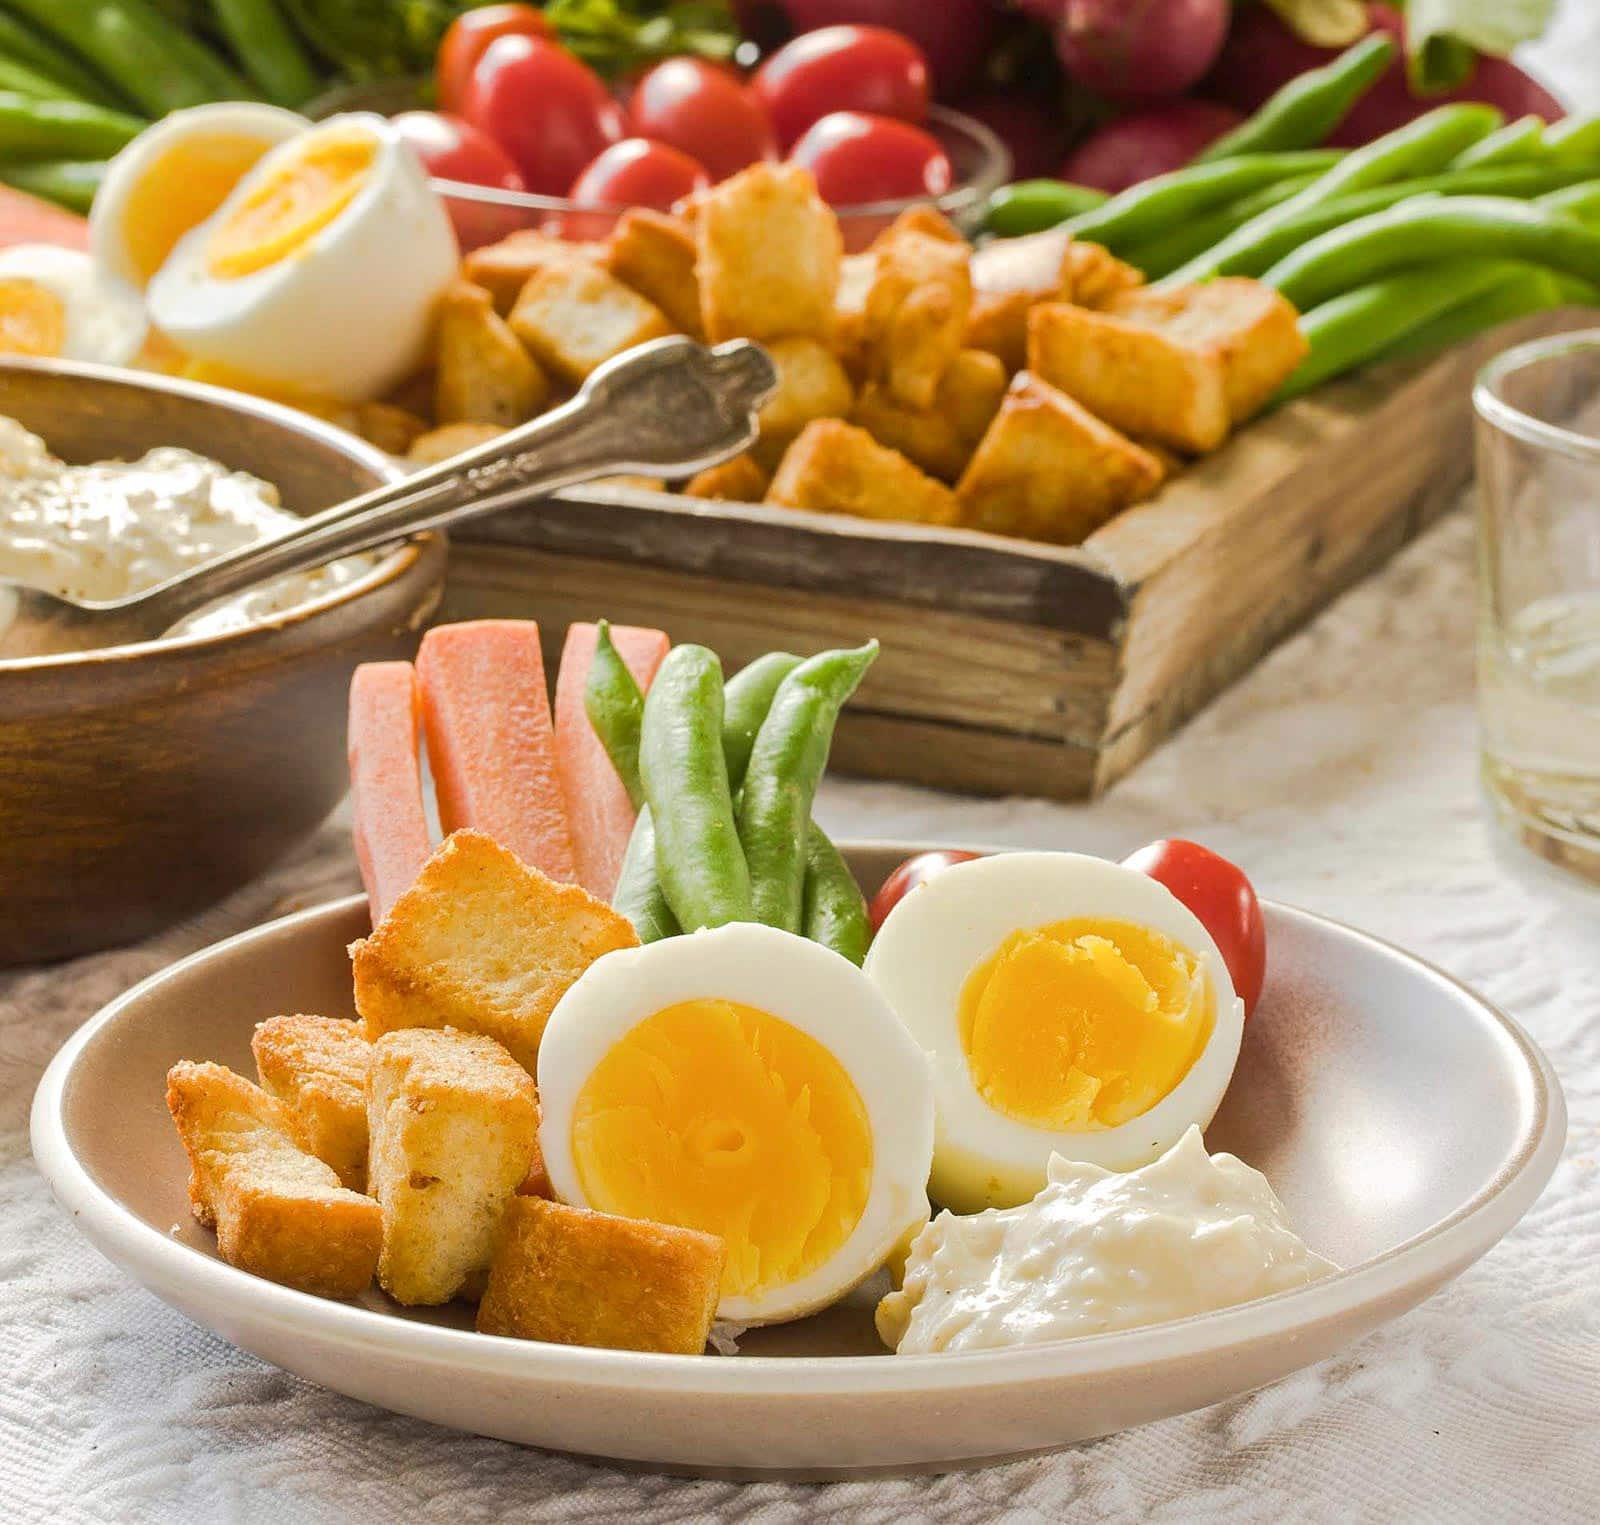 Spring Recipe: Creamy Parmesan Dip